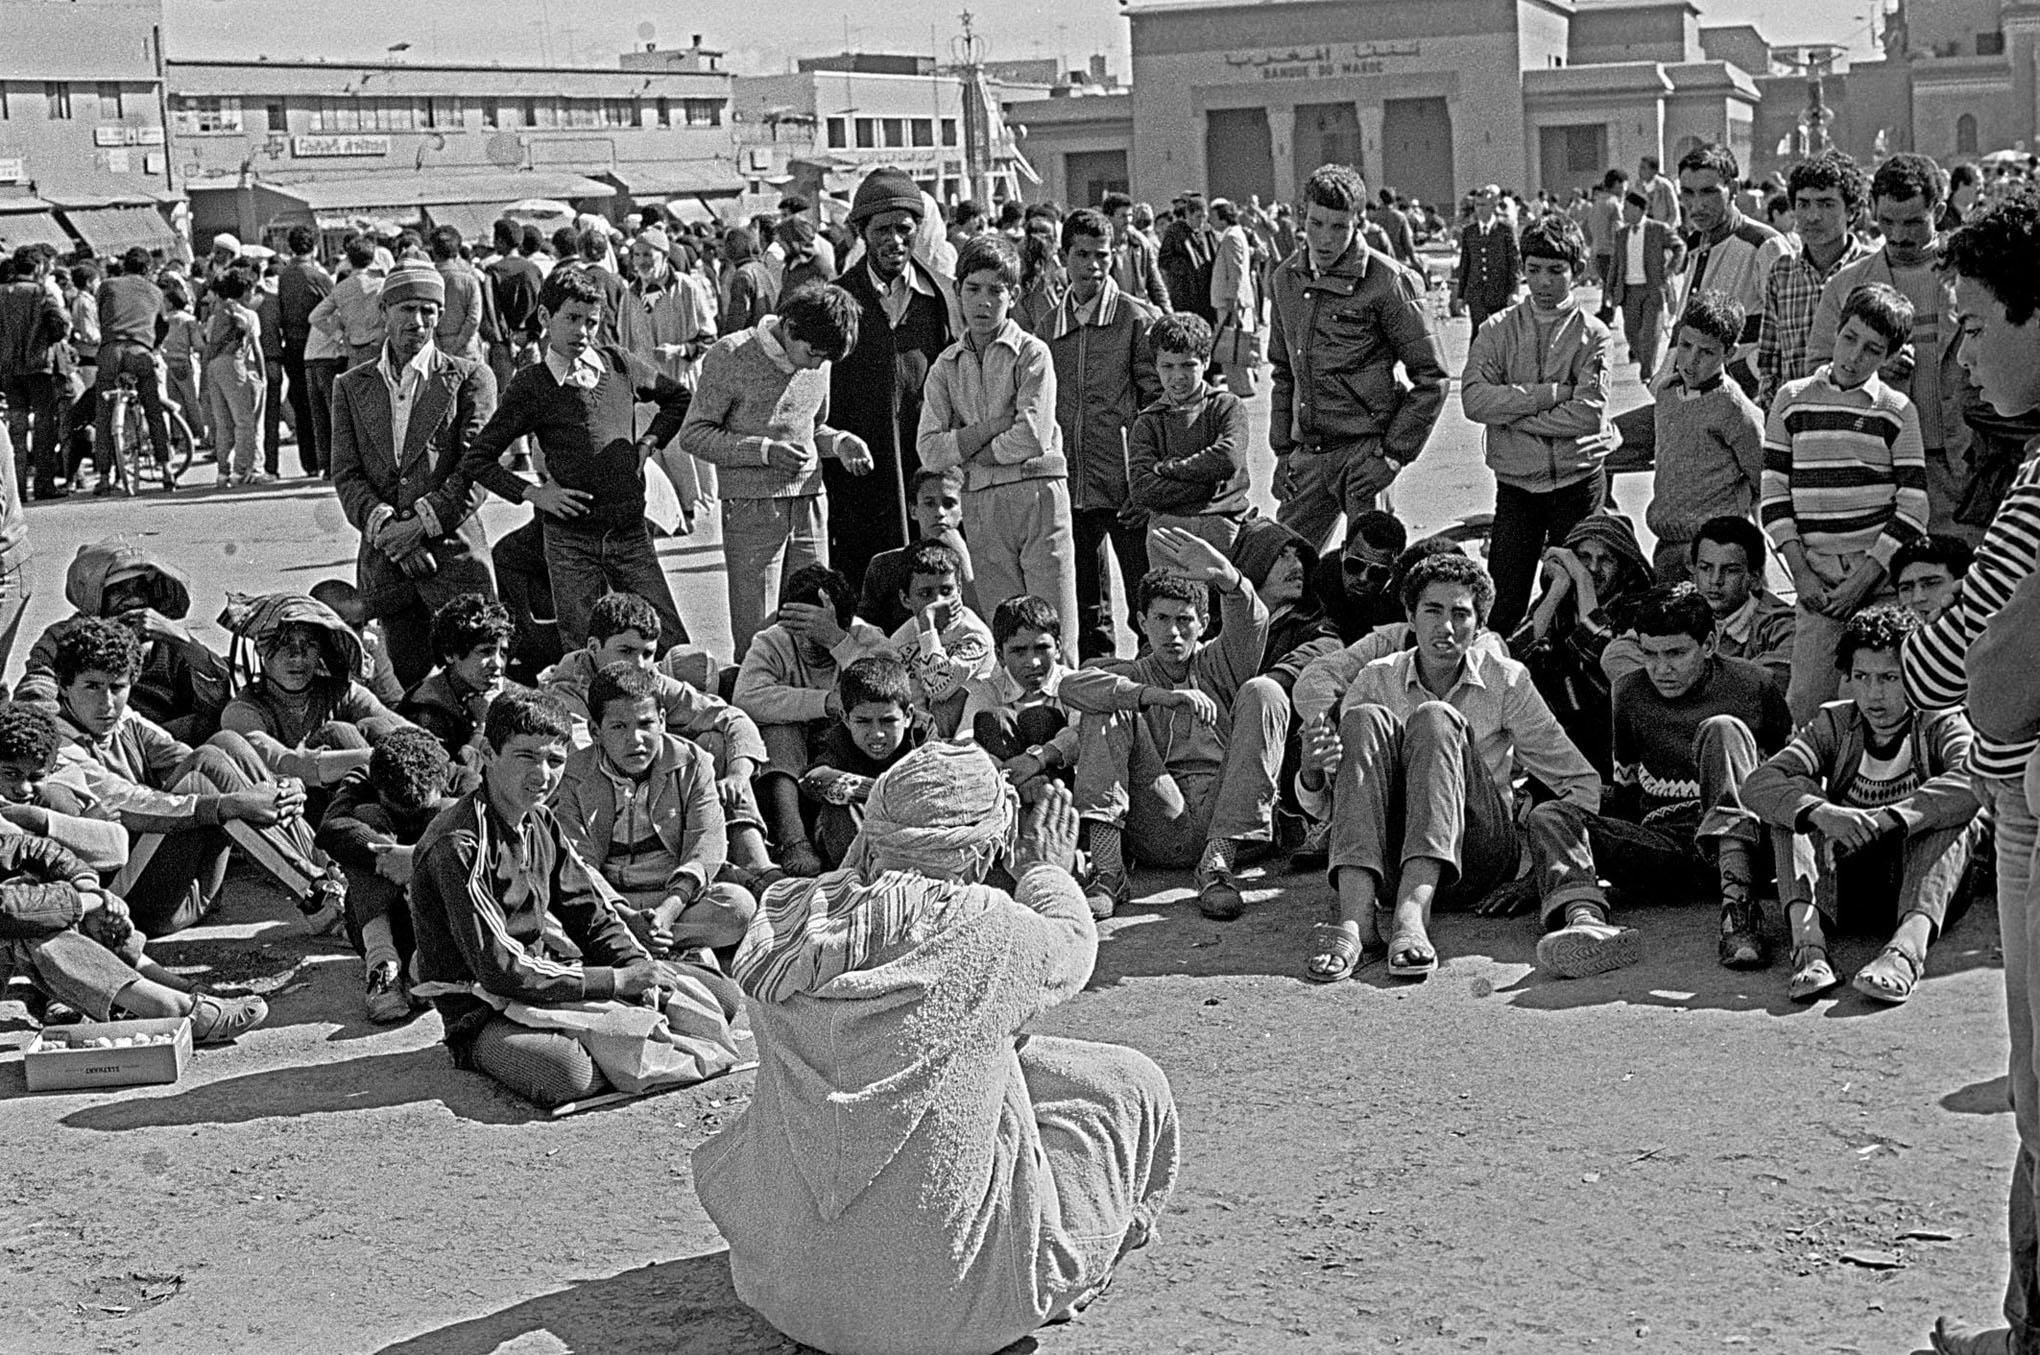 Moroccans: Boys & Young Men - 1a